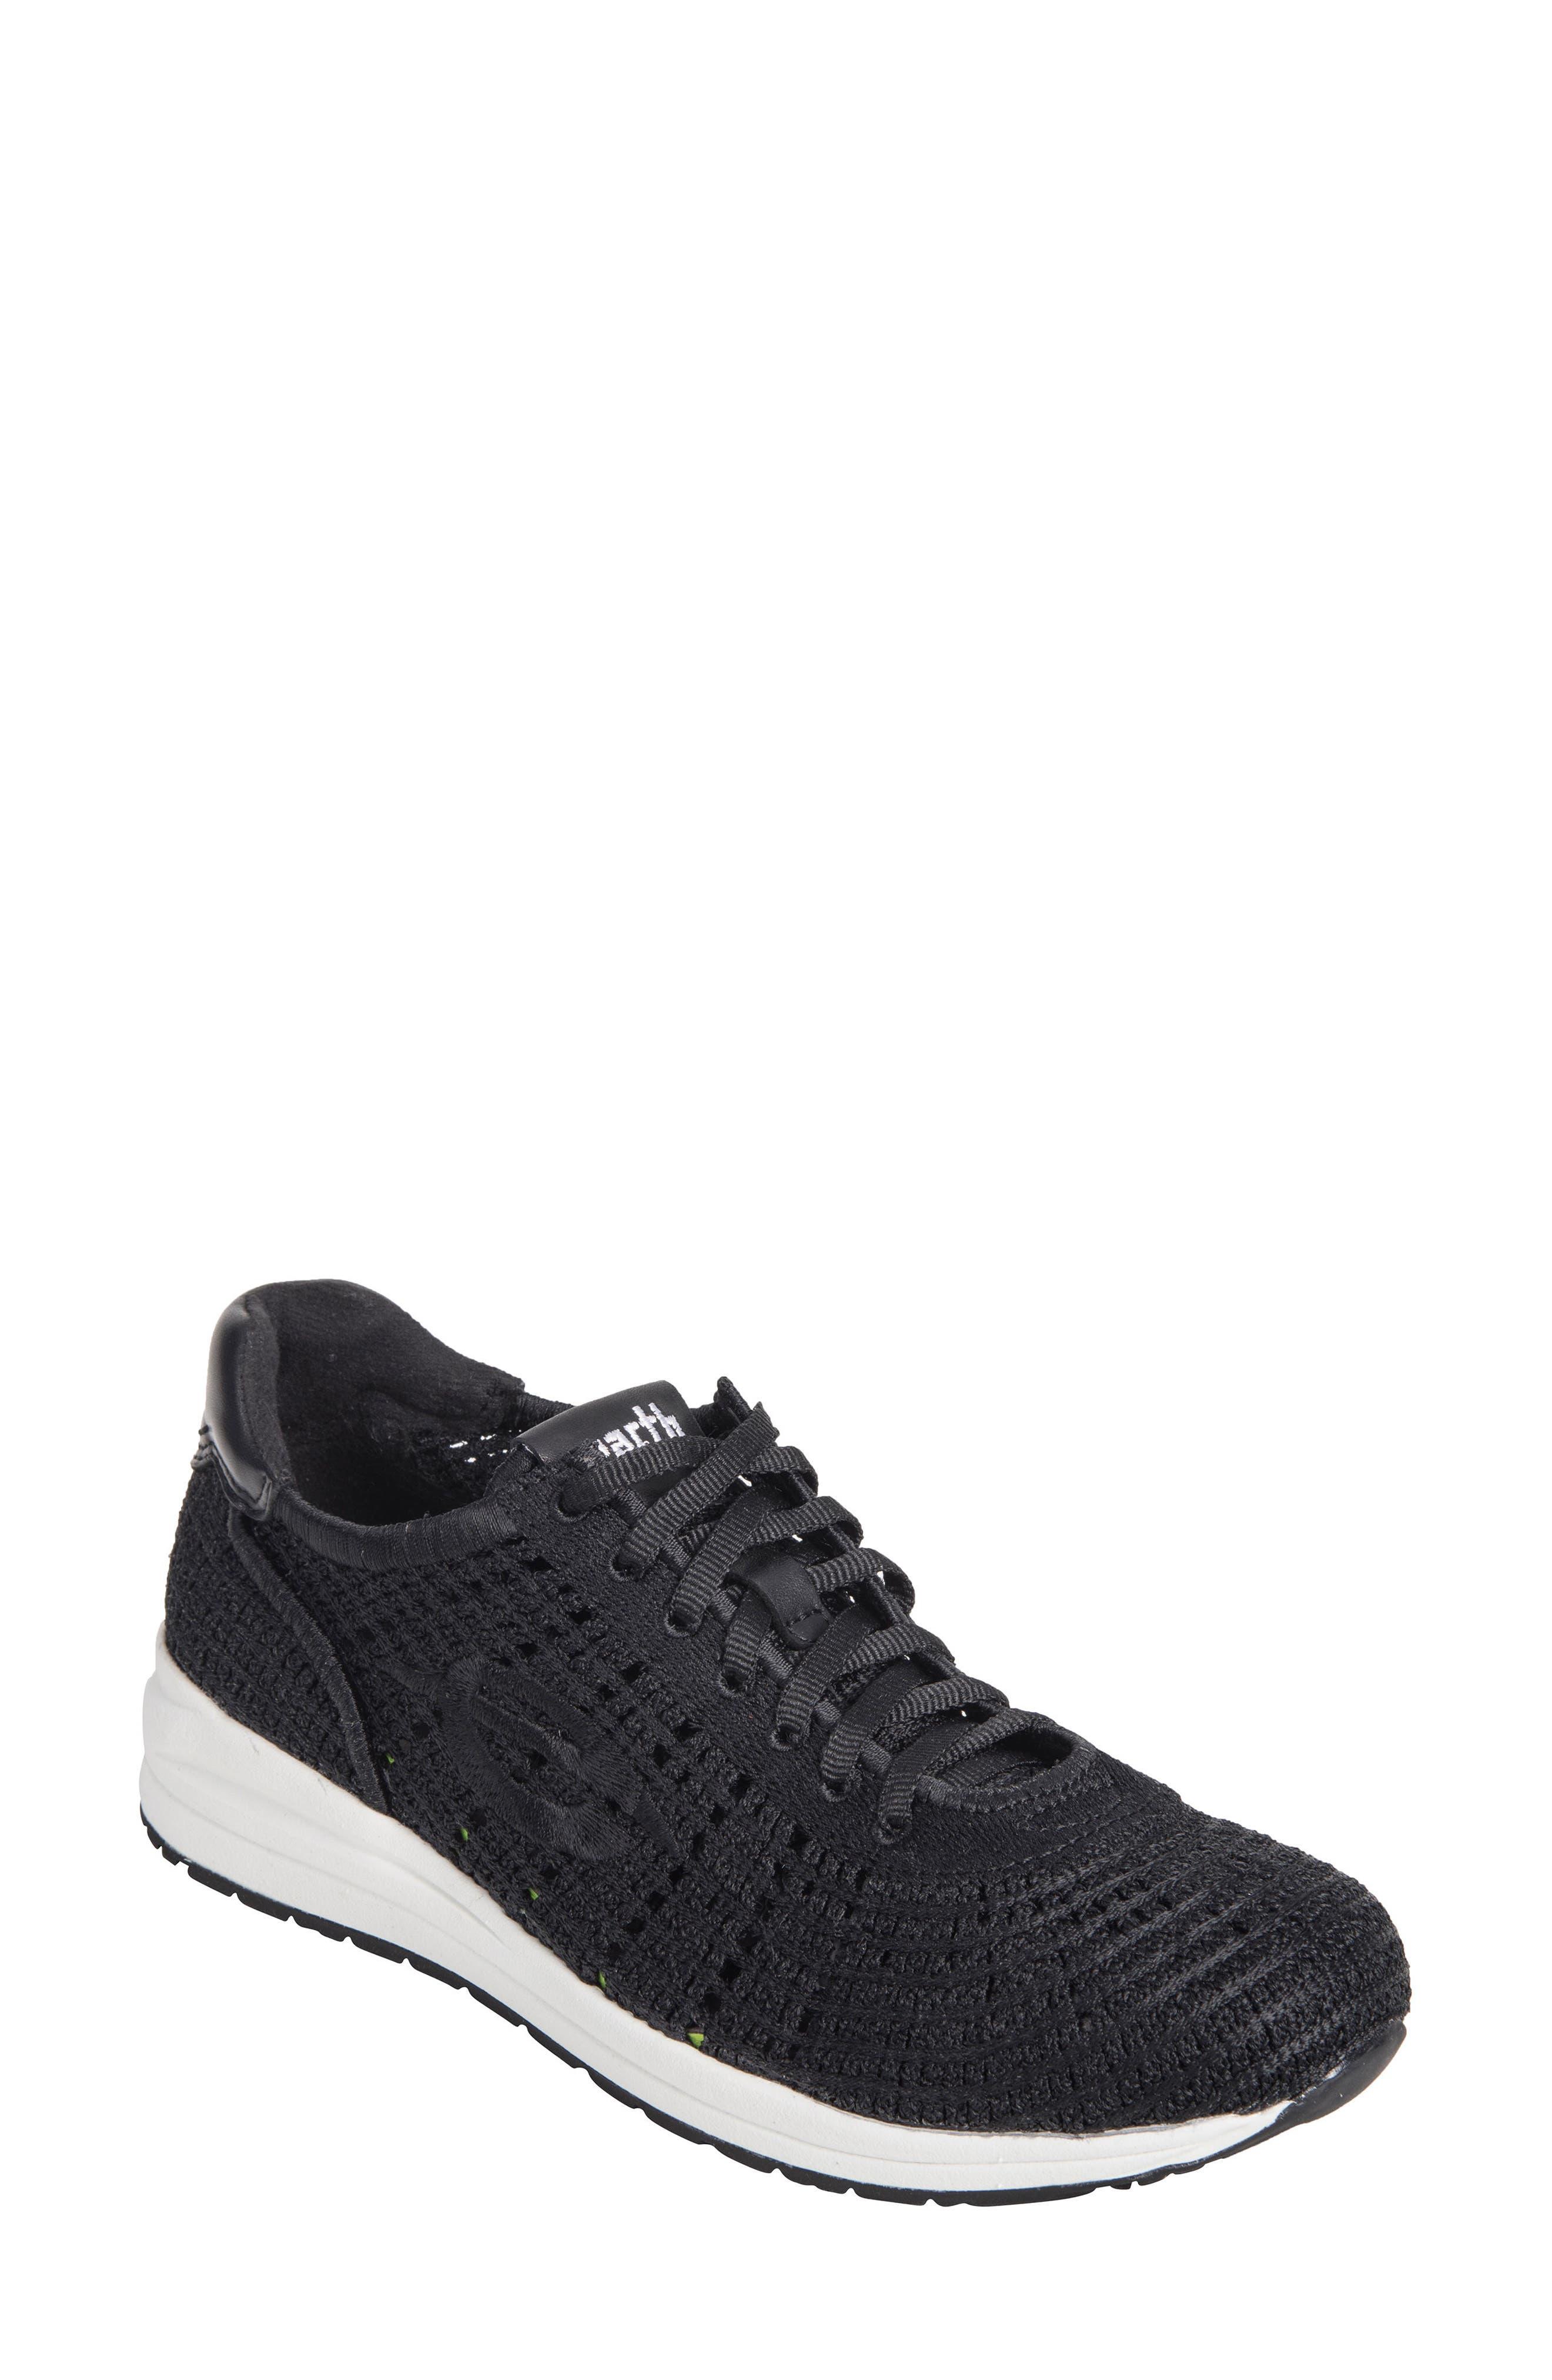 Earth Vital Sneaker,                         Main,                         color, Black